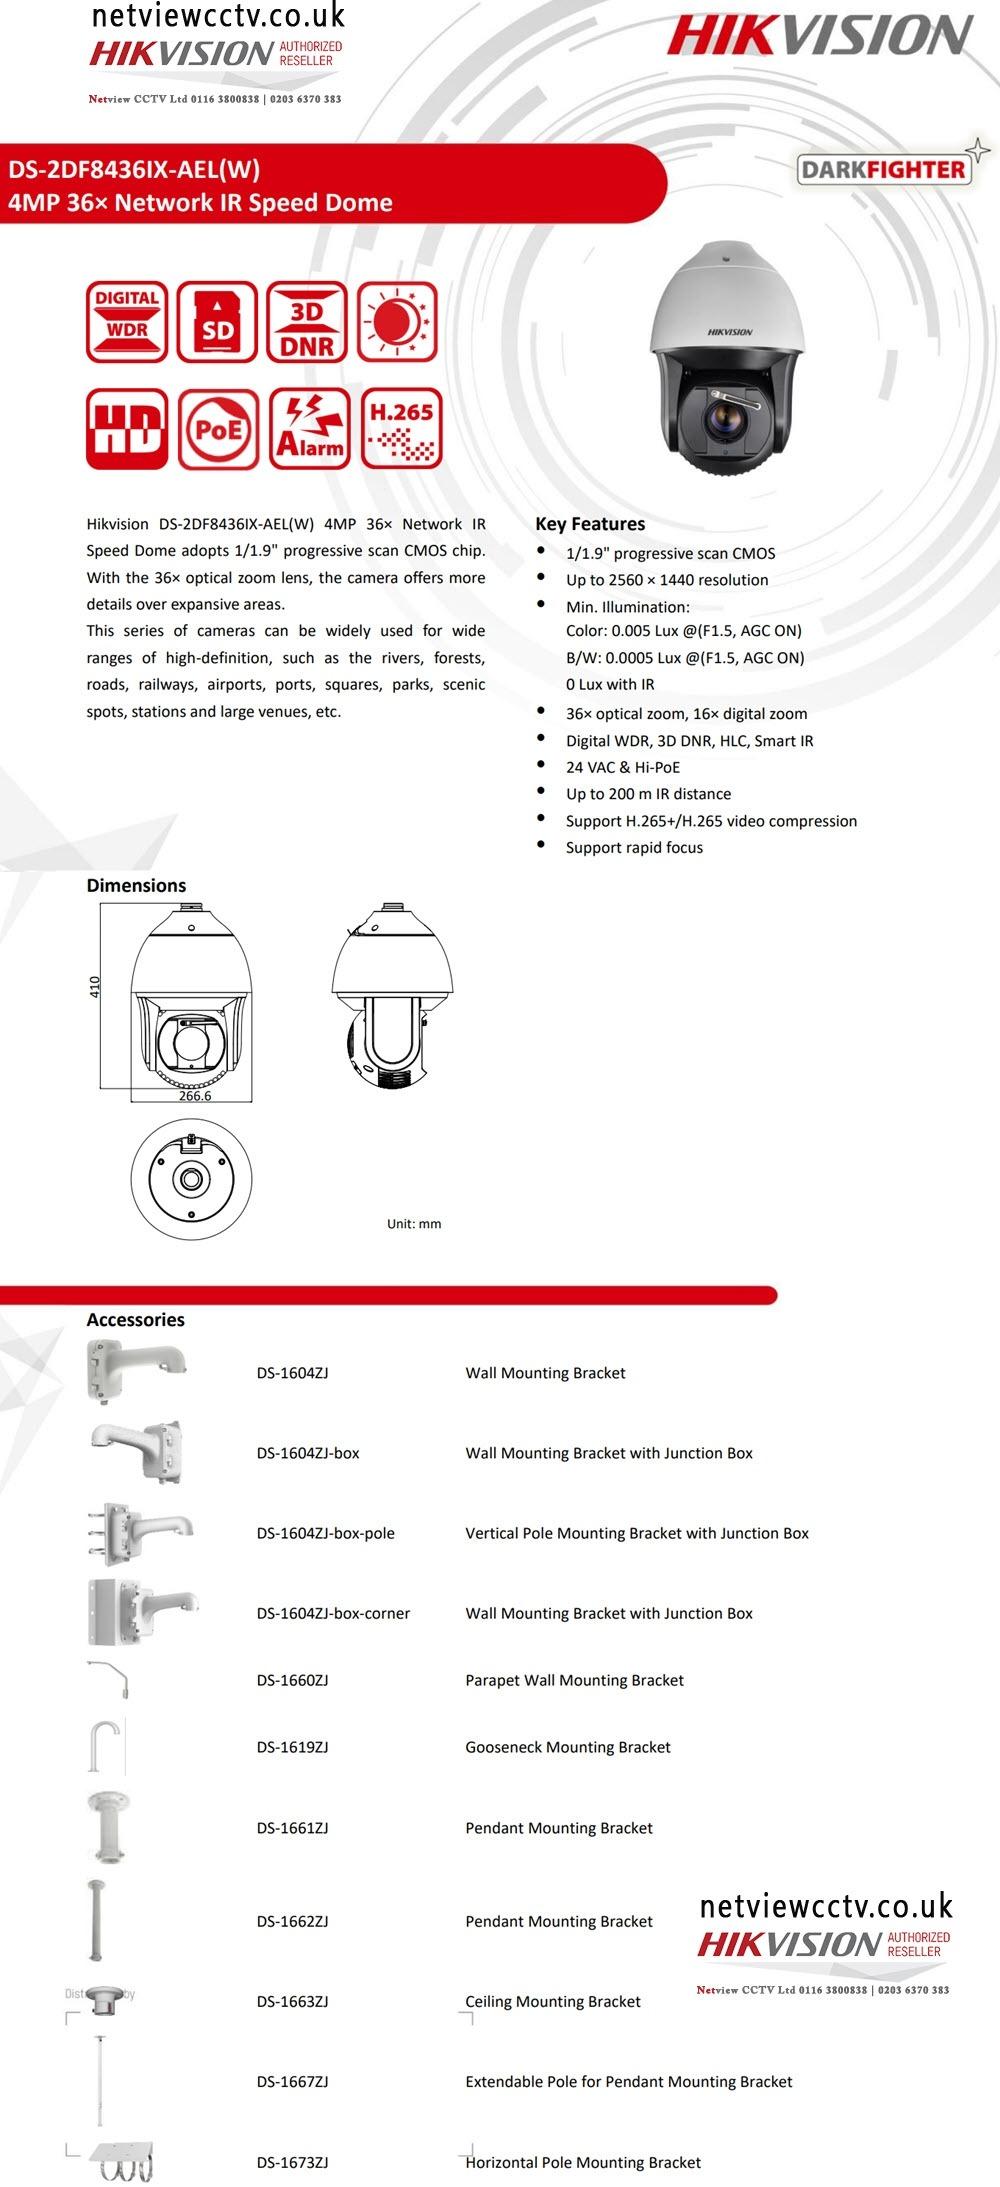 4MP DS-2DF8436IX-AELW Hikvision IP 36x Darkfighter PTZ with Auto Tracking, 200m IR &Wiper